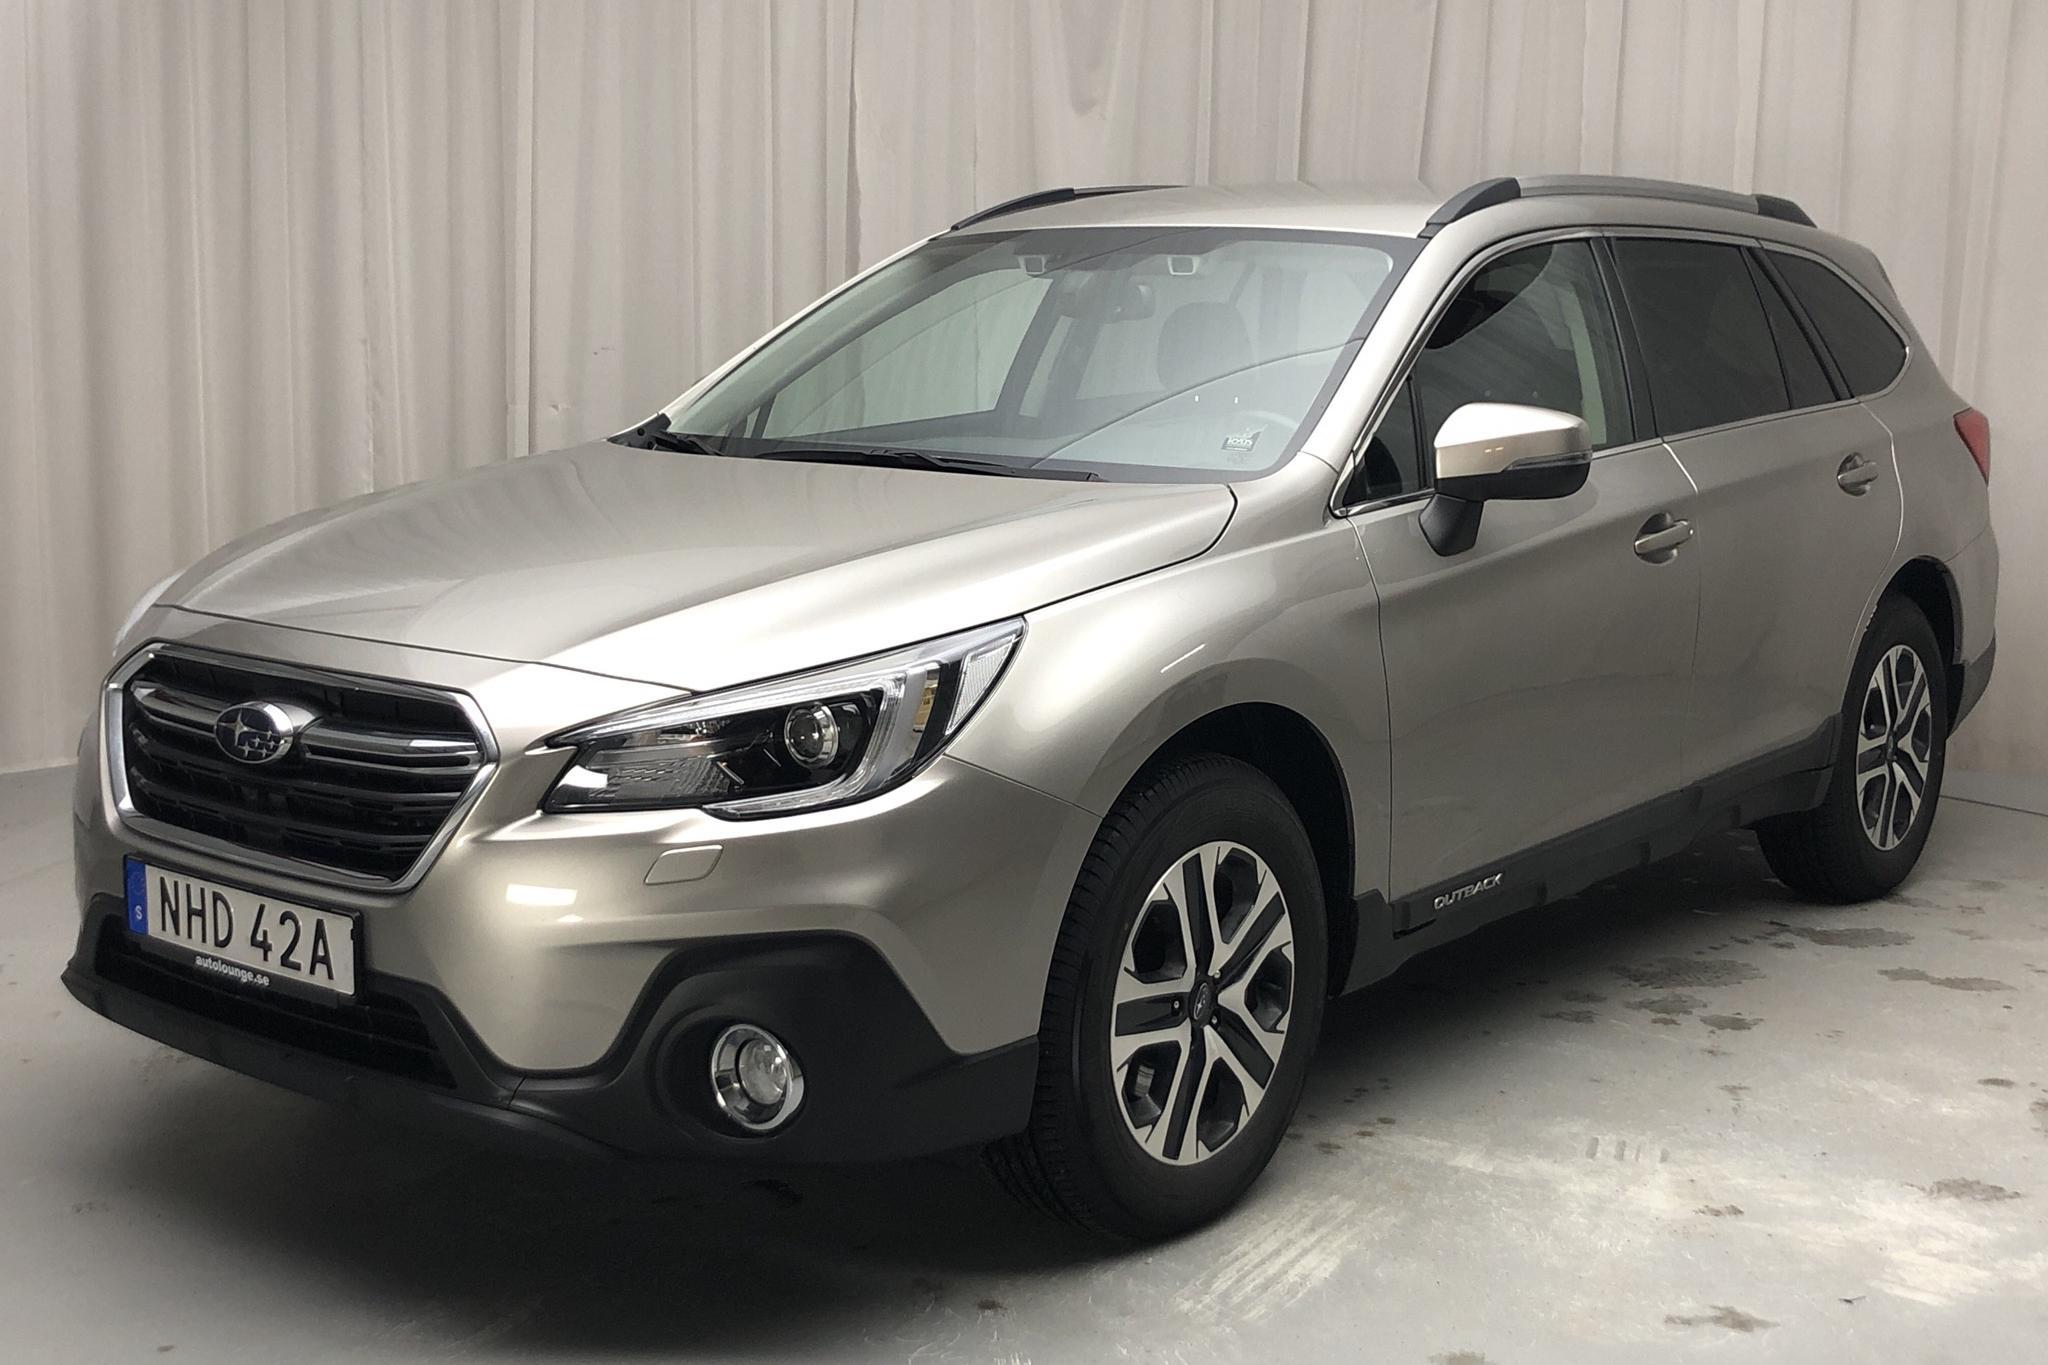 Subaru Outback 2.5i 4WD (173hk) - 2 850 mil - Automat - Light Brown - 2019